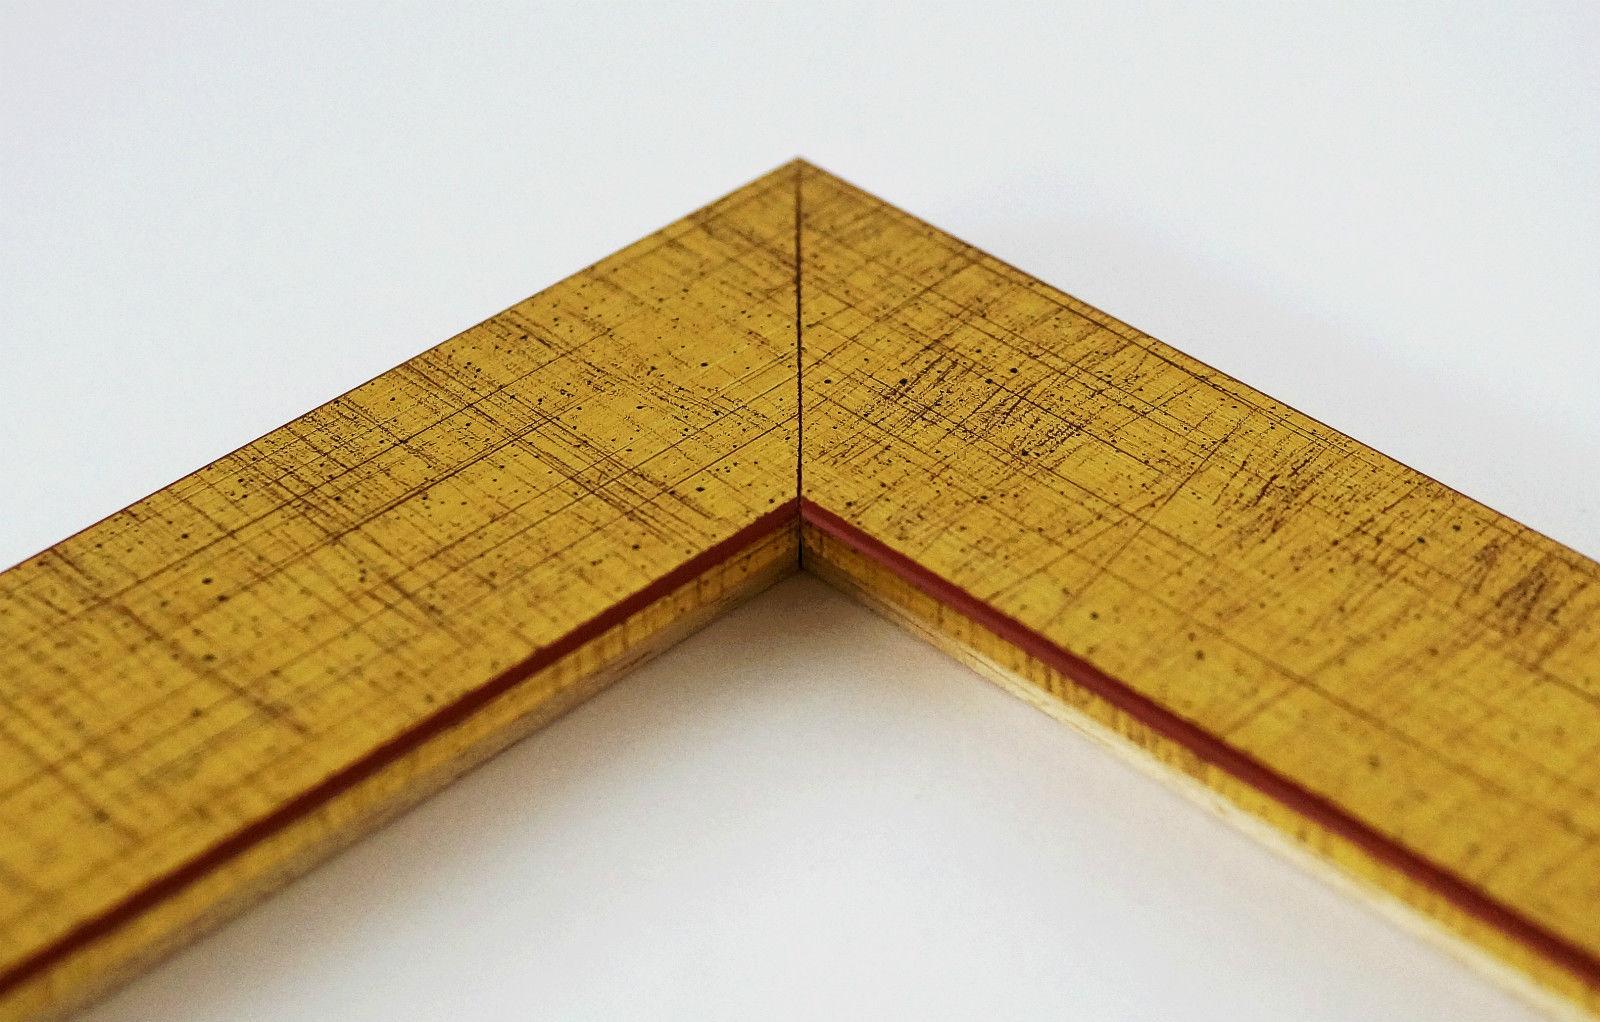 Bilderrahmen Gold Modern Shabby Schlicht Rahmen Holz Duisburg 4, 3 ...